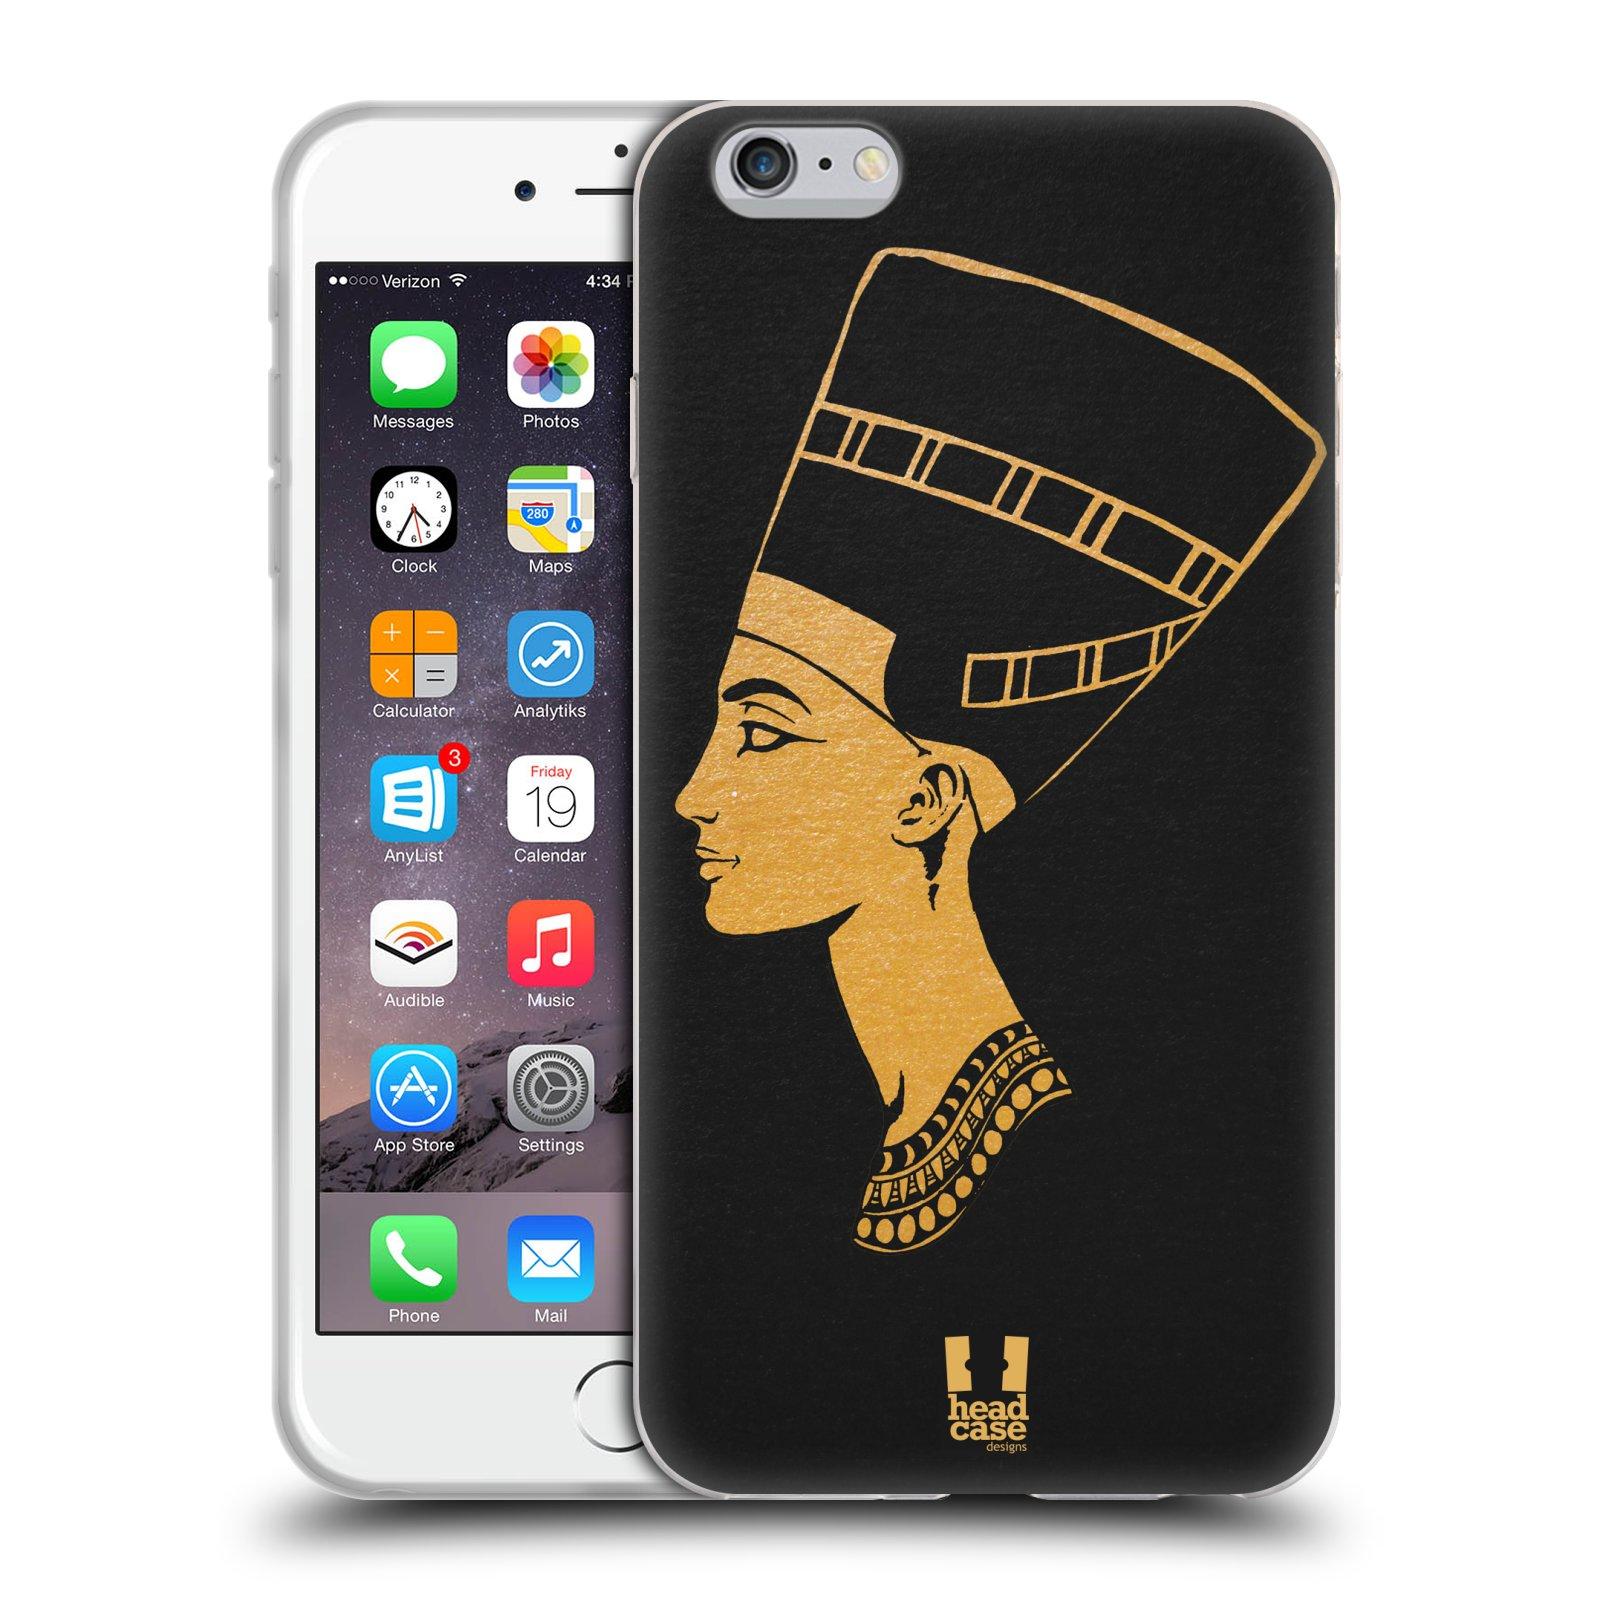 HEAD CASE silikonový obal na mobil Apple Iphone 6 PLUS/ 6S PLUS vzor EGYPT zlatá a černá Nefertiti